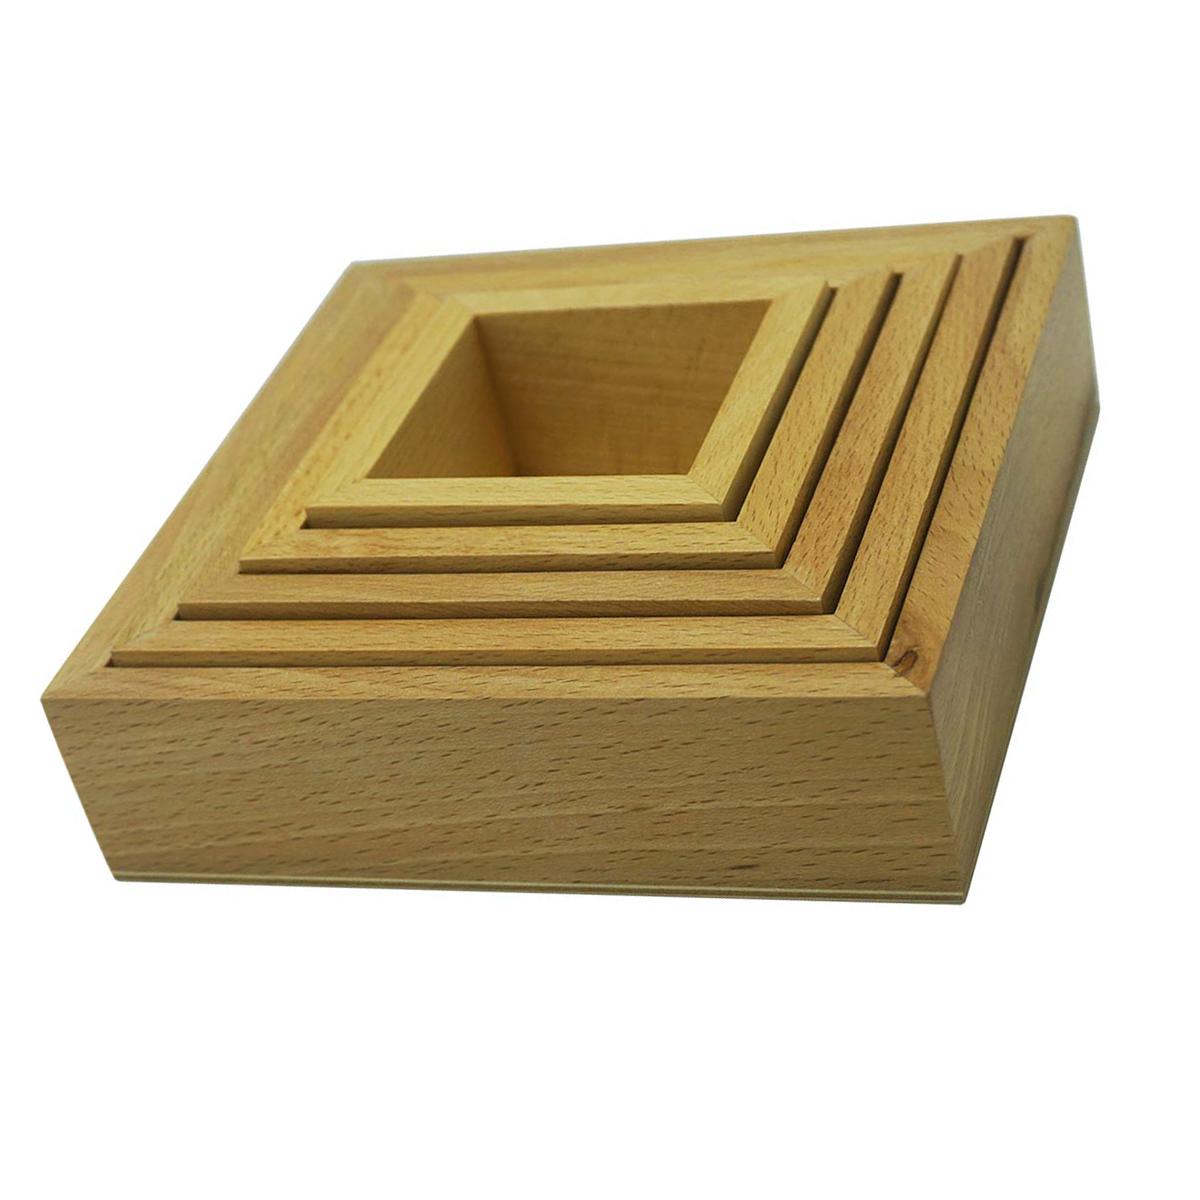 Nesting Boxes Montessori Wooden Nesting Sorting Square